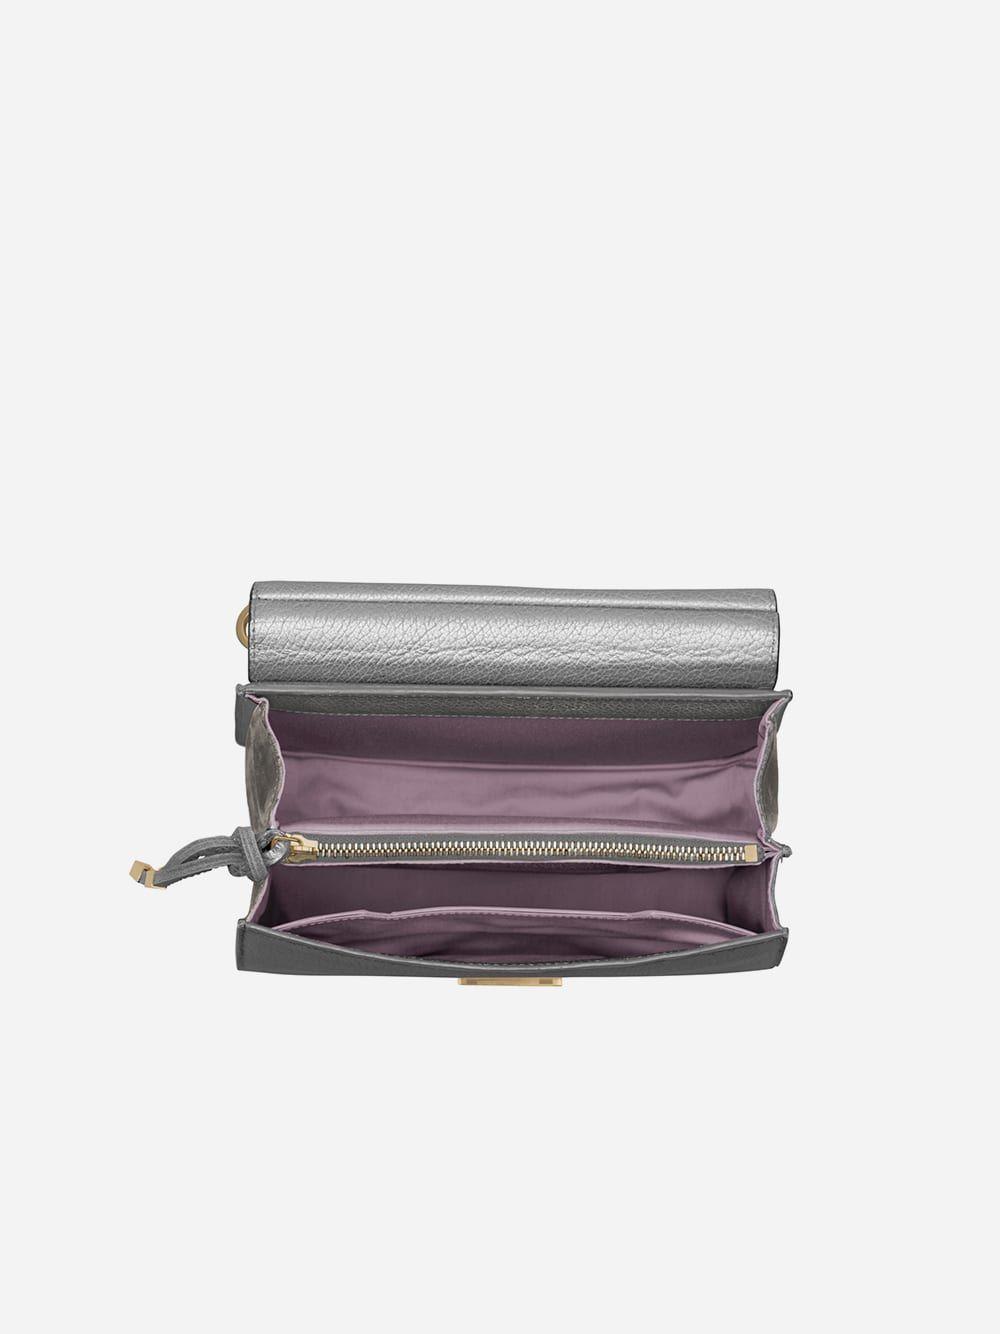 Marlene Silver Briefcase Mini Tablet | Maison Héroïne